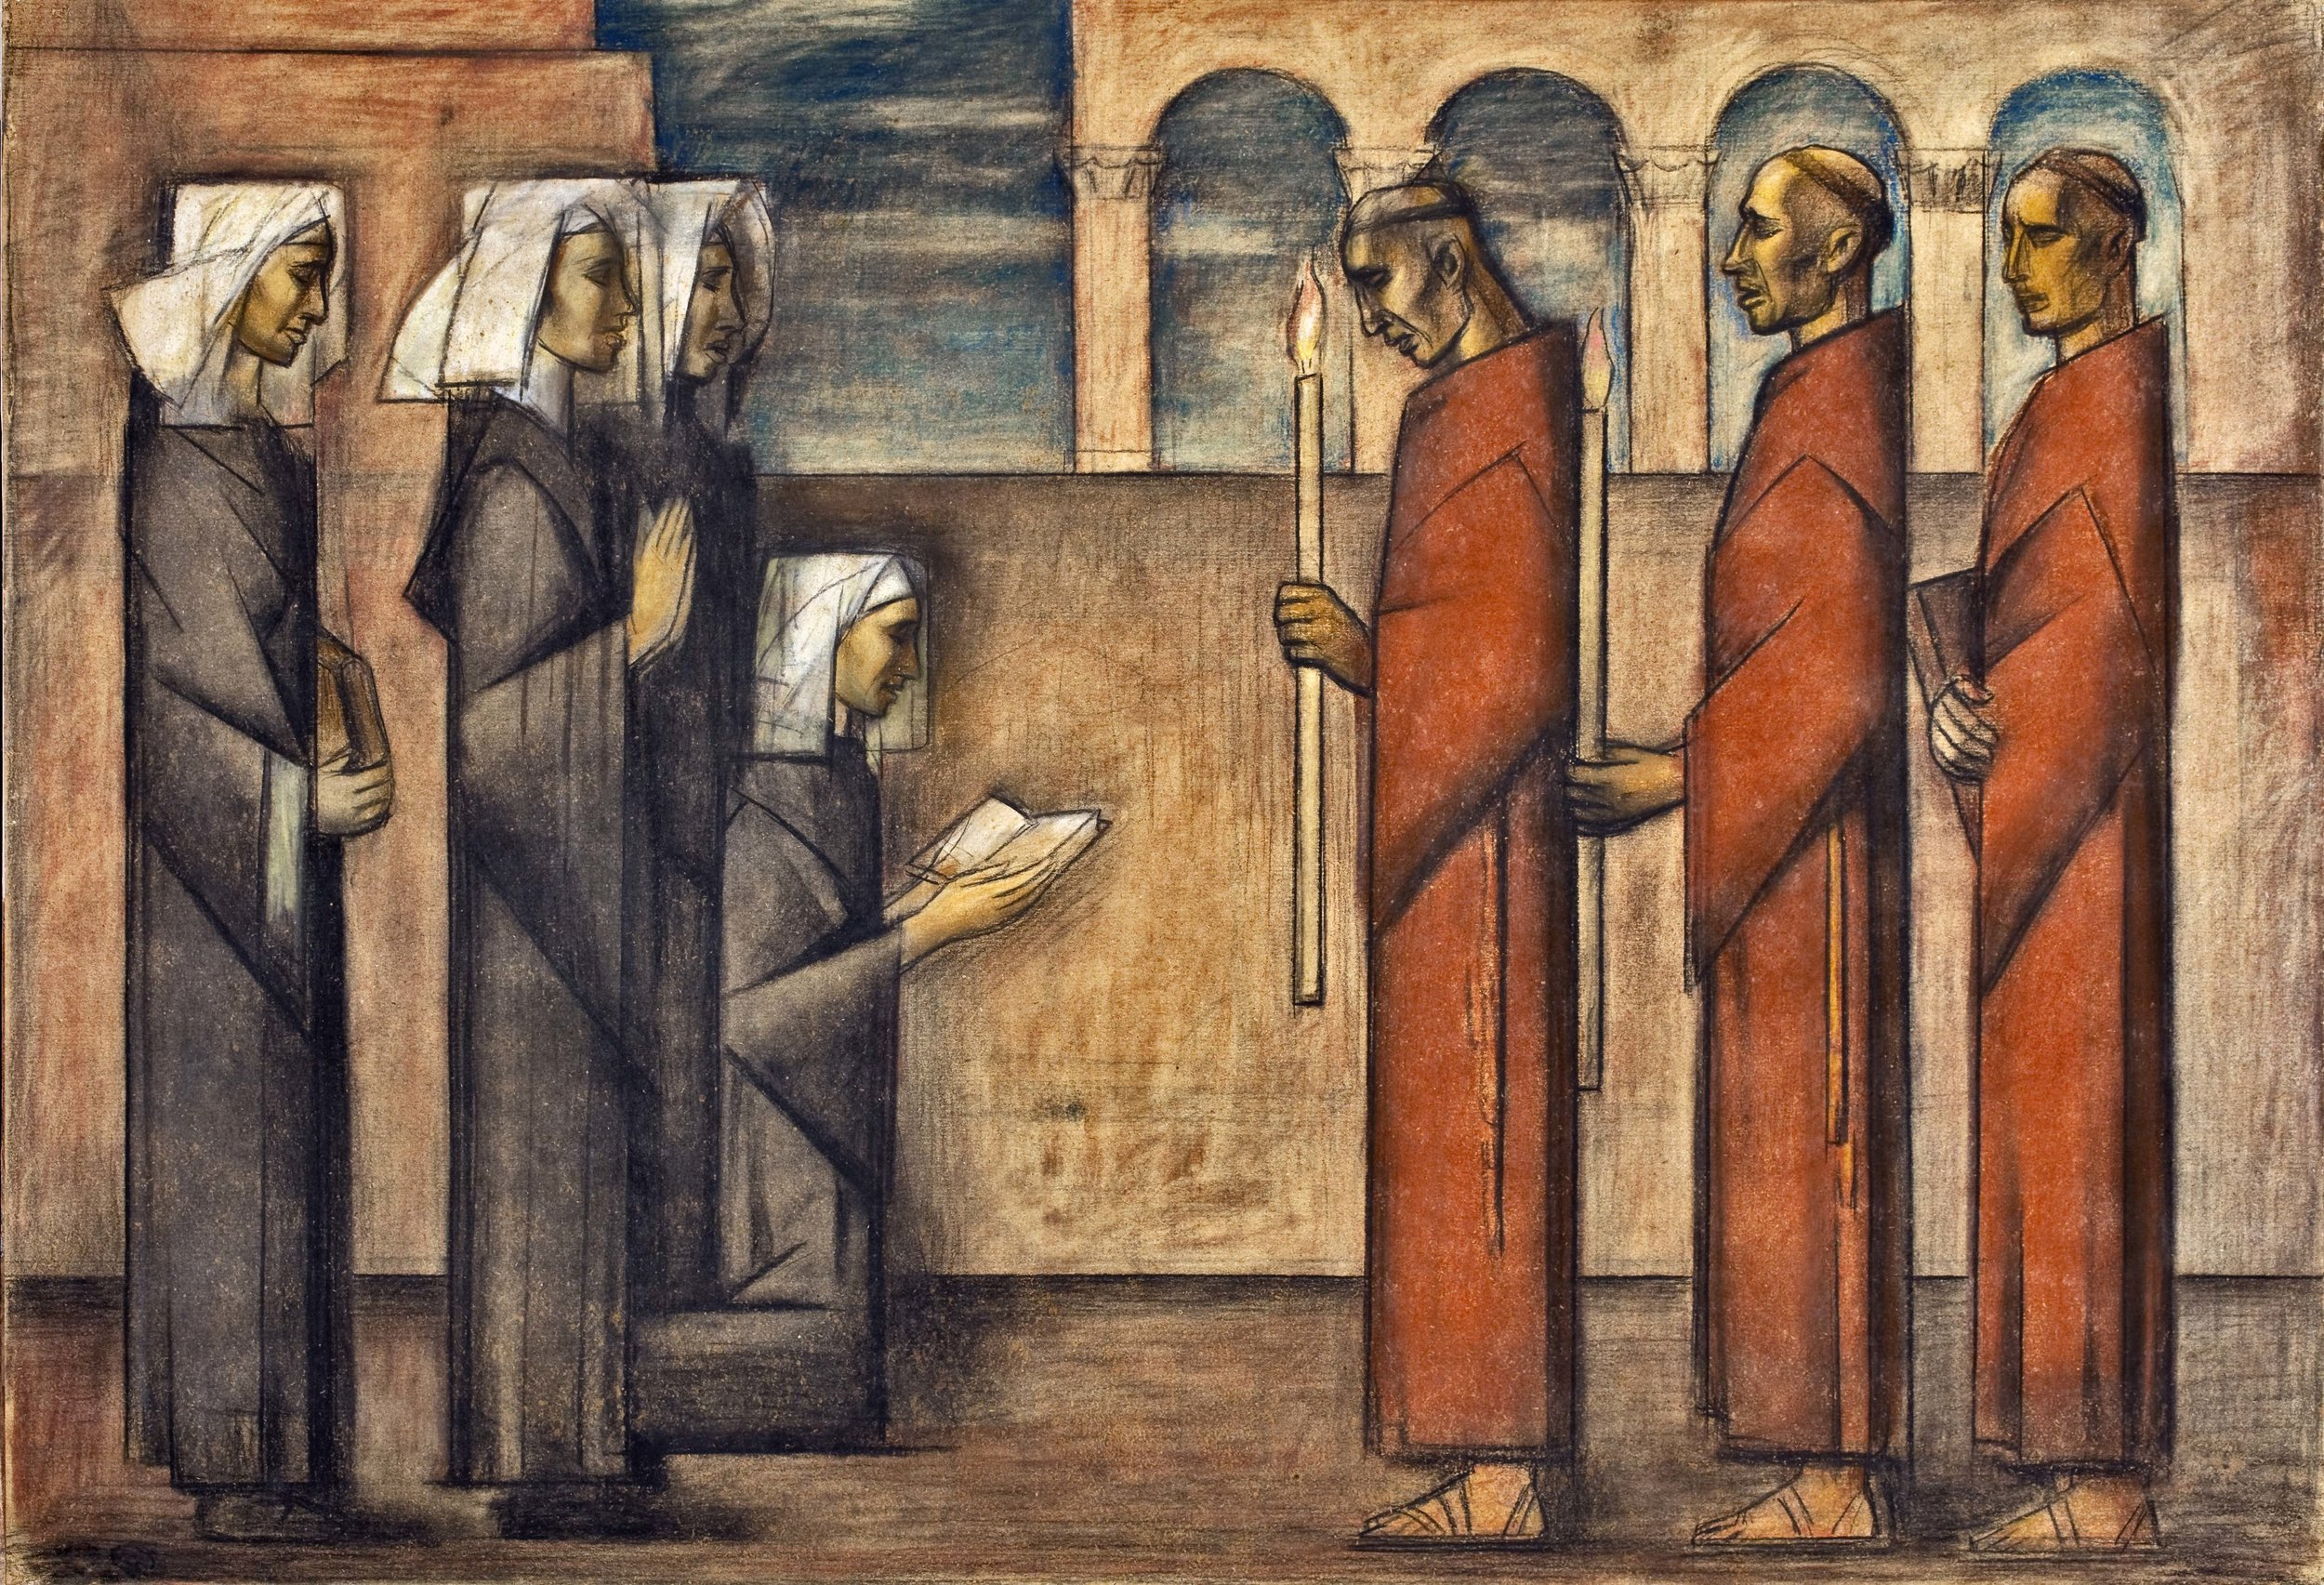 Frailes y Monjas / Friars and Nuns  ca. 1936 pastel / pintura al pastel 23.3 x 34.4 inches; 59.1 x 87.3 centímetros San Diego Museum of Art